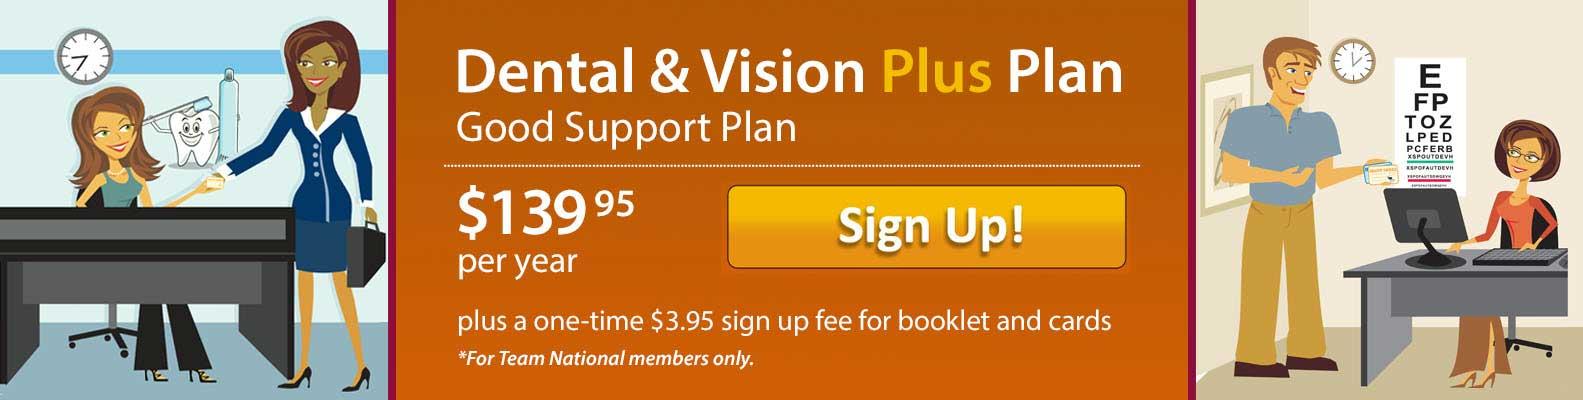 DENTAL AND VISION PLUS PLAN - Distinct Benefit Solutions